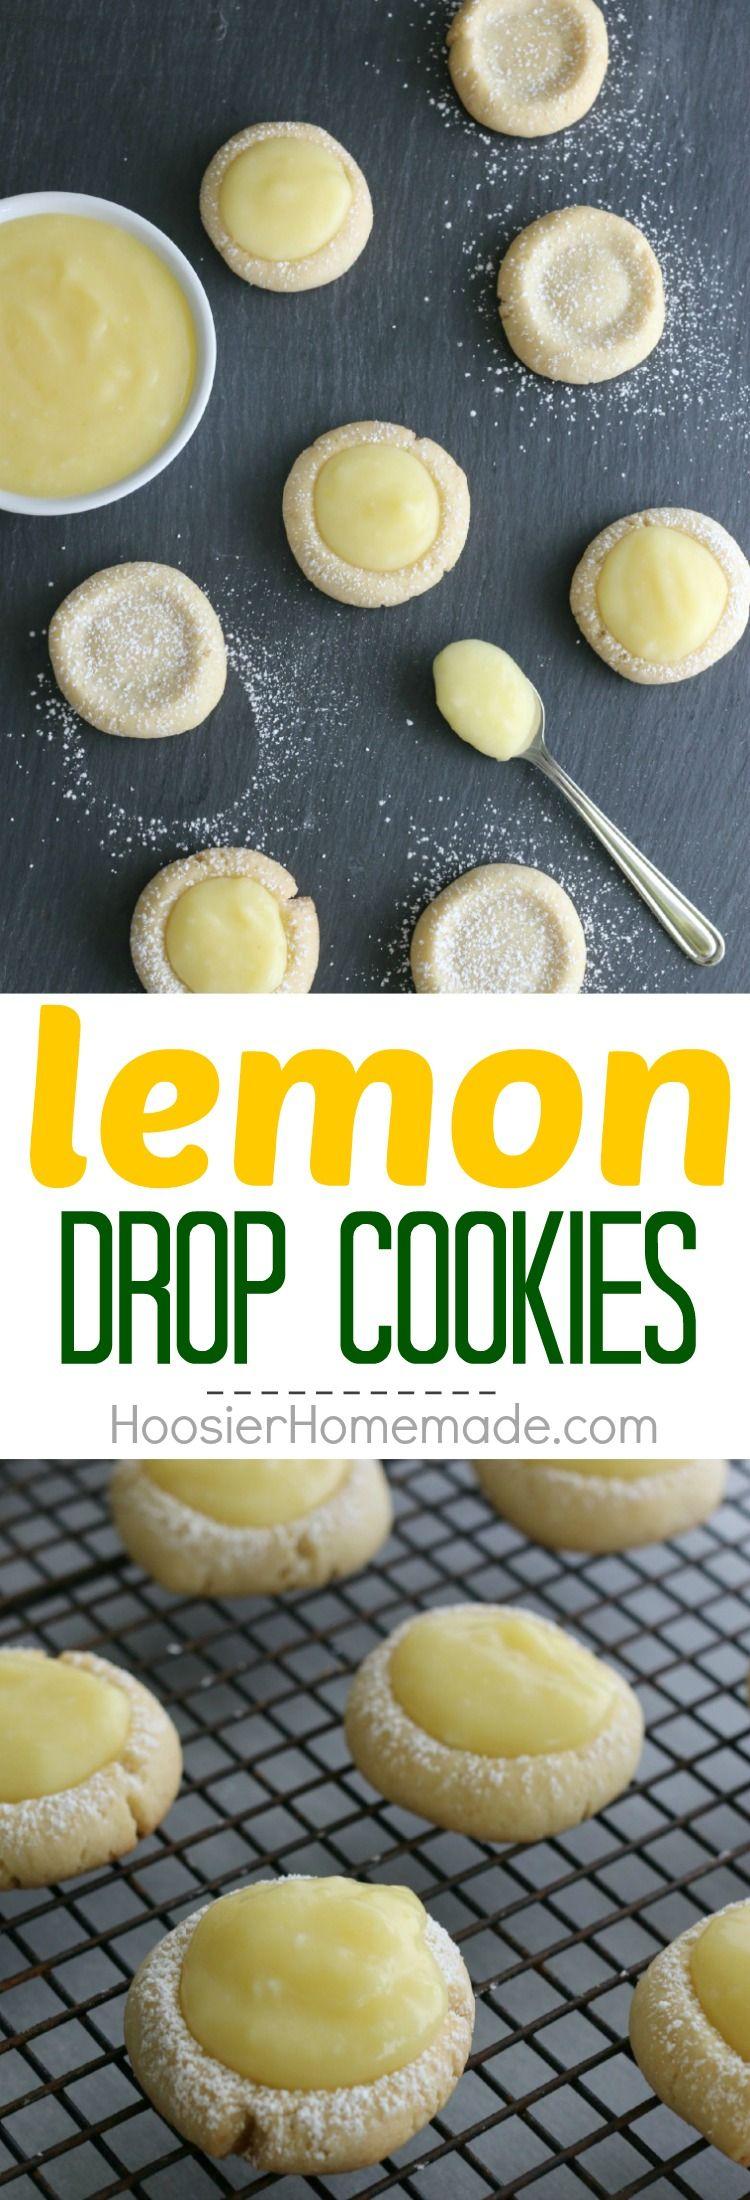 Lemon Drop Cookies Bridal Shower RecipesBridal